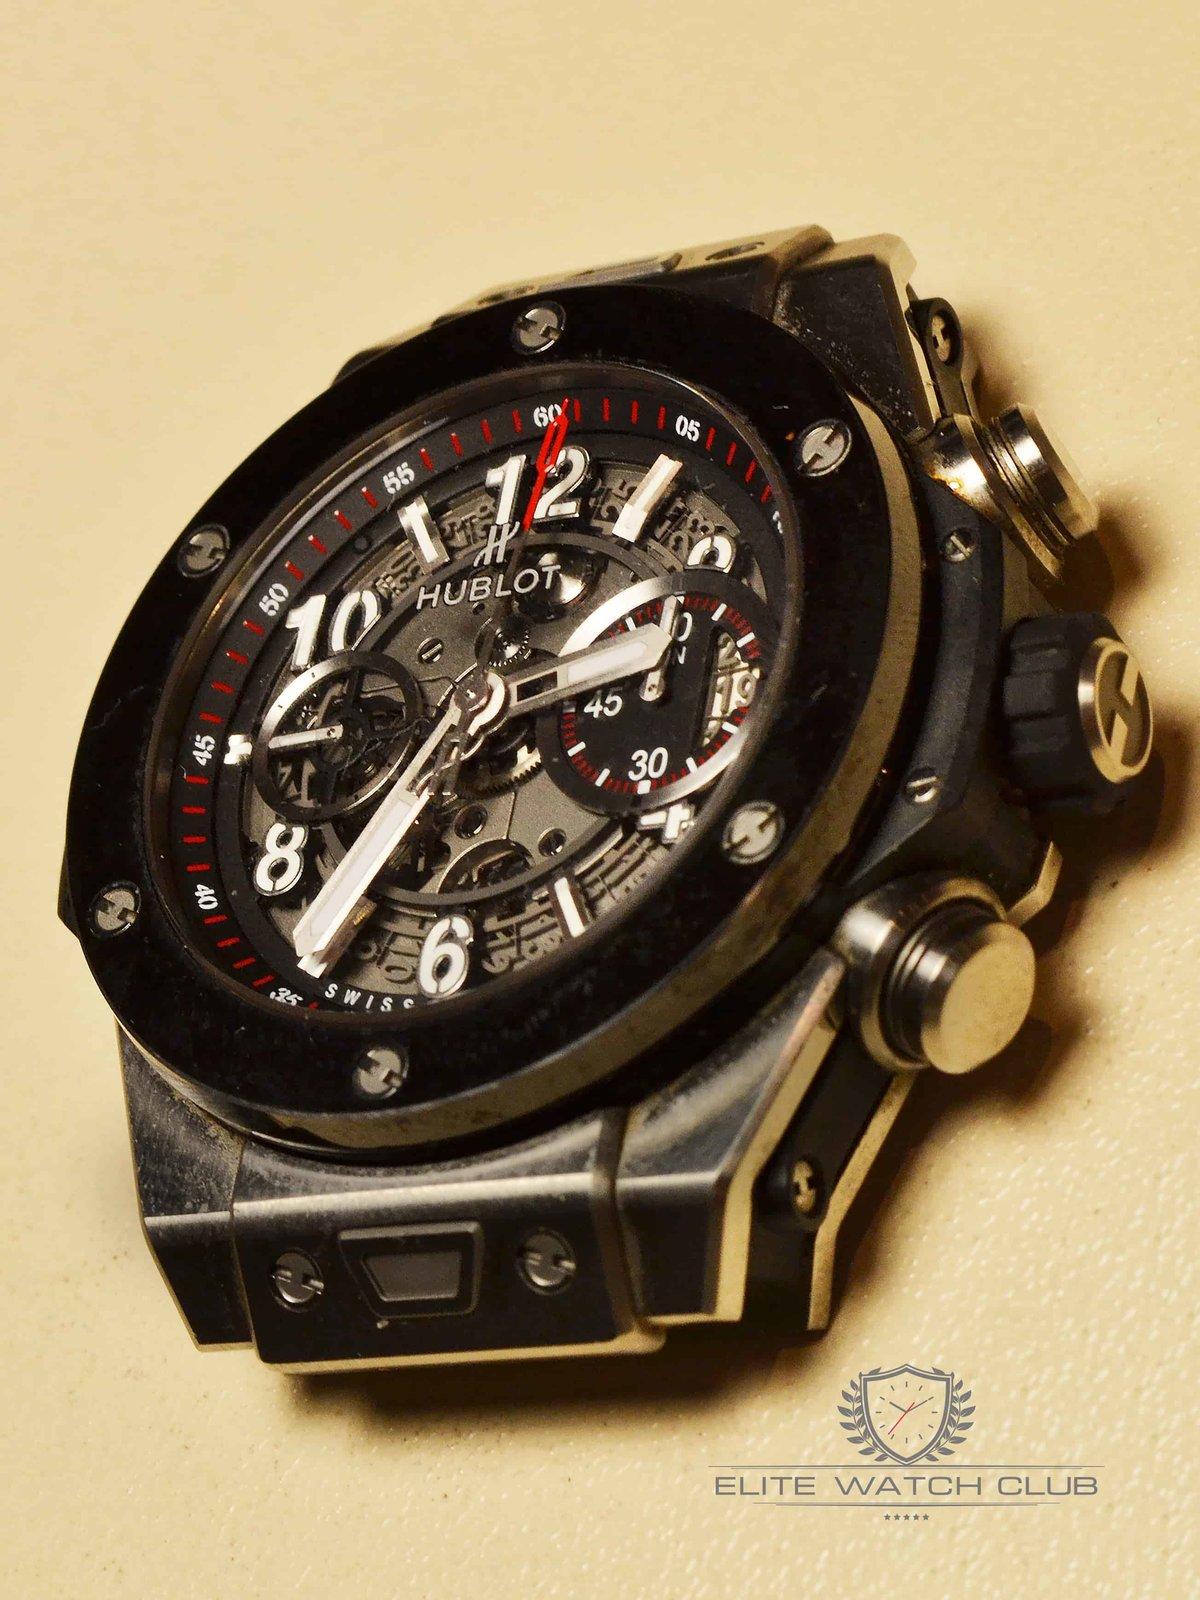 340b0b8e127b Элитные часы hublot копия Официальный сайт 📌 http   bit.ly 2sSZOHt ...